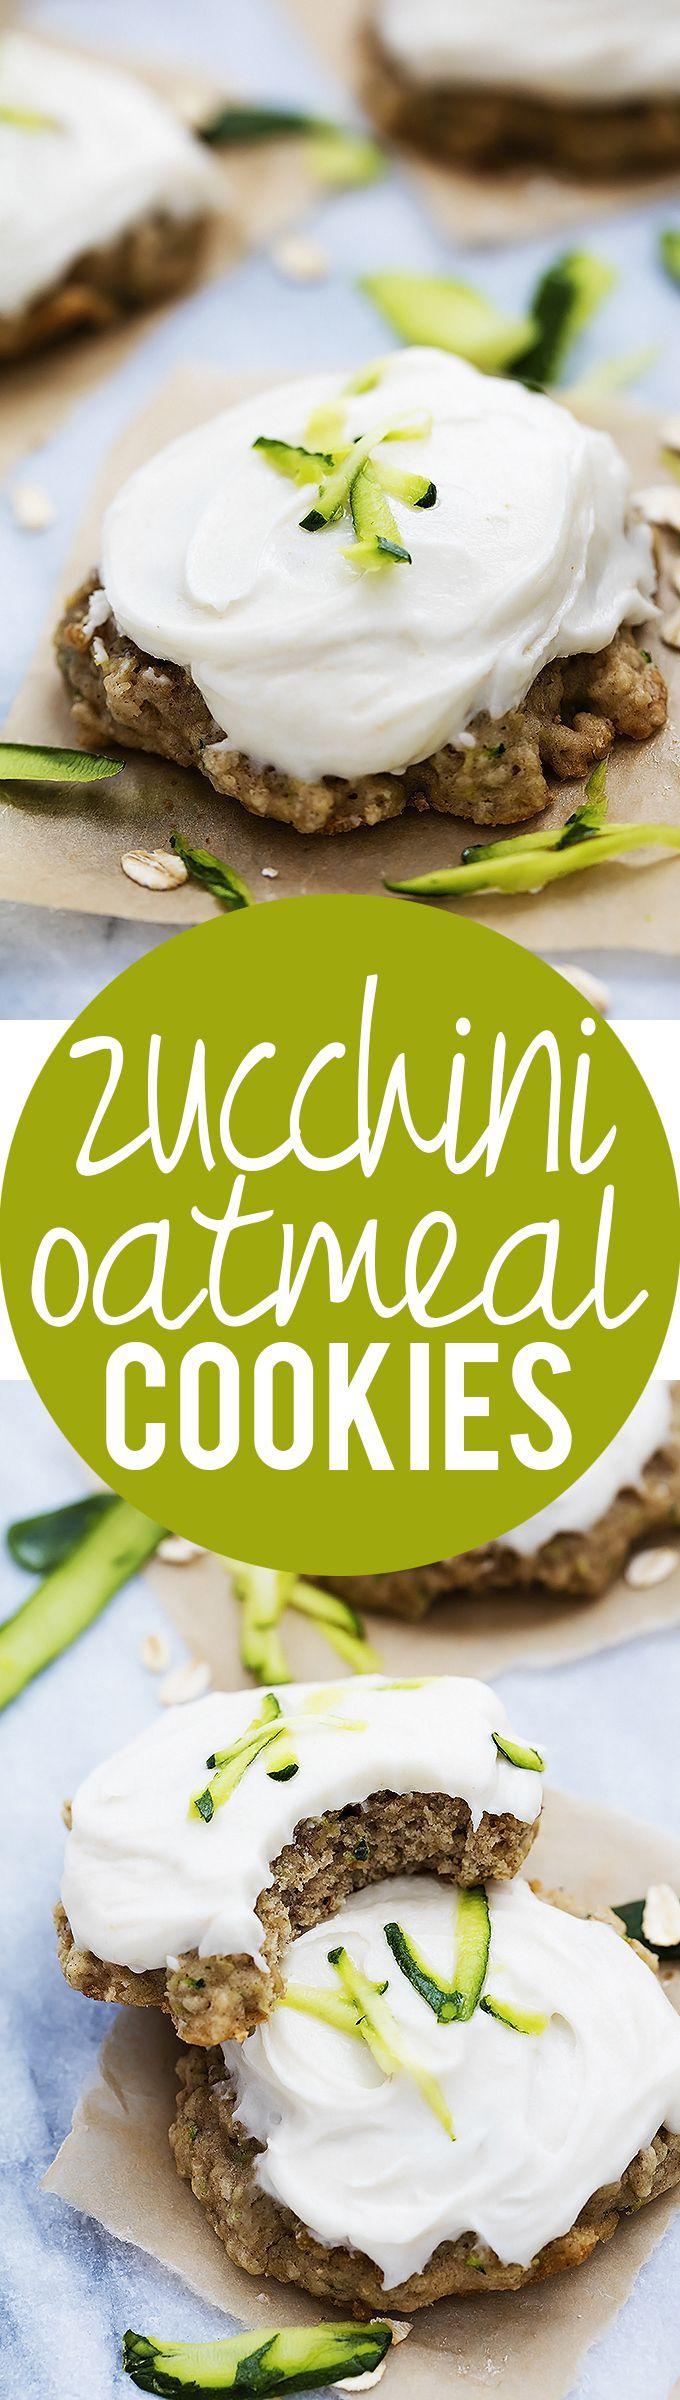 Zucchini Oatmeal Cookies with Cream Cheese Frosting | Creme de la Crumb